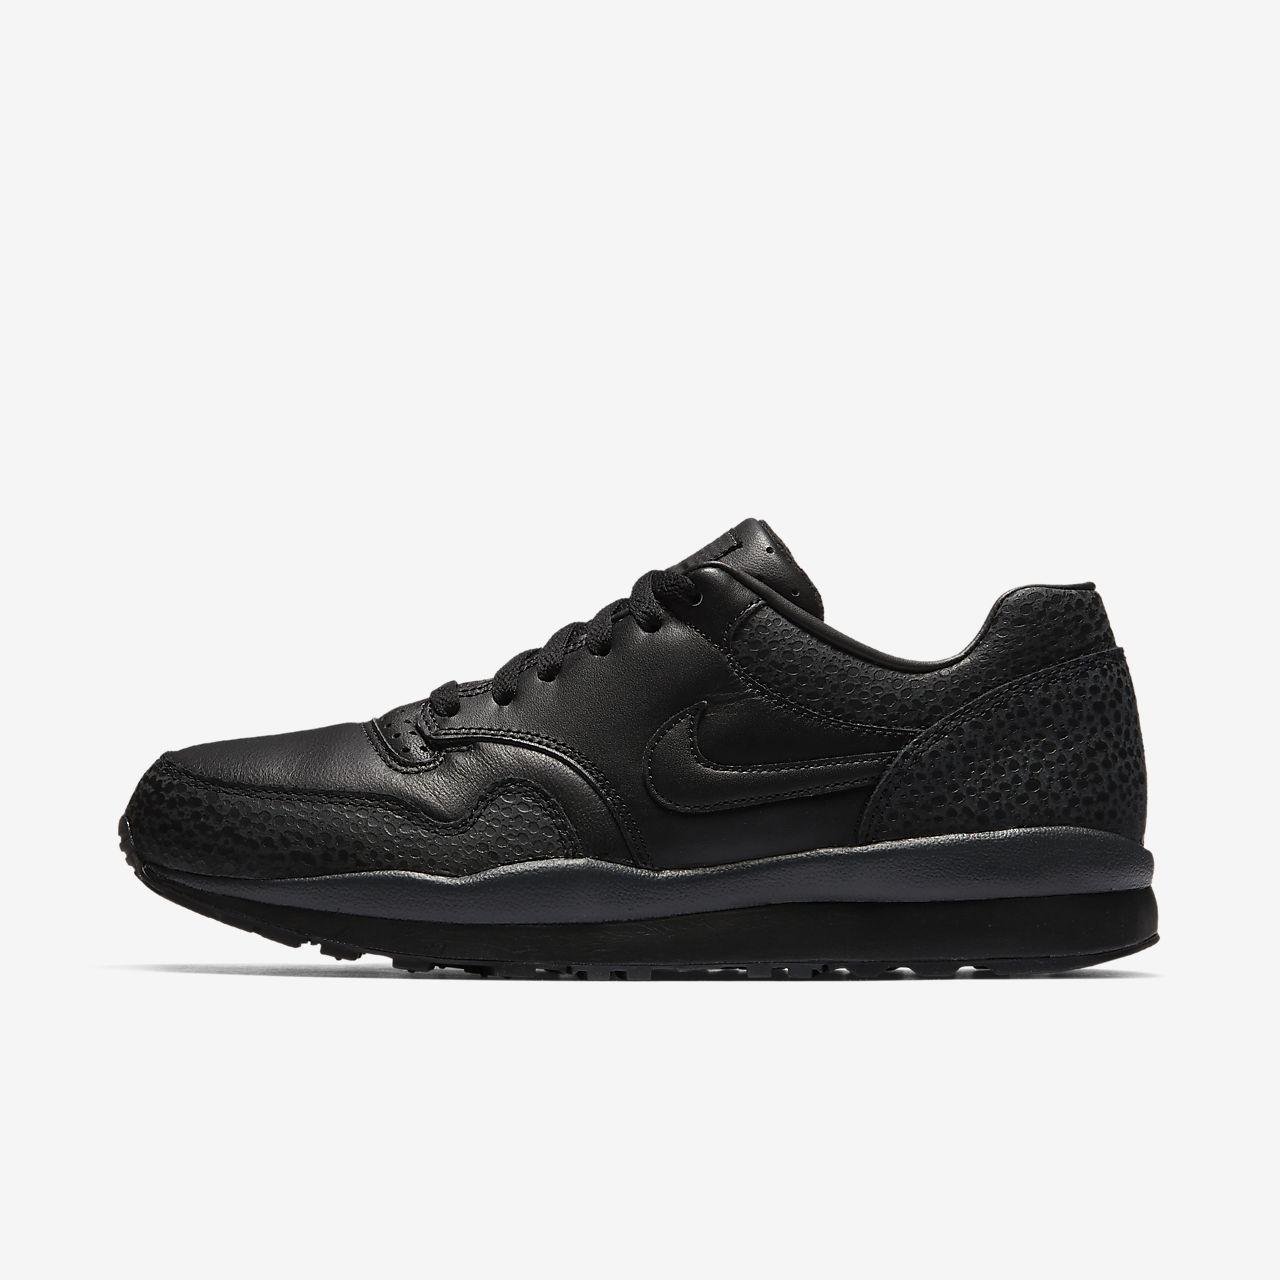 online retailer b5566 da58f Nike Air Safari QS Herenschoen